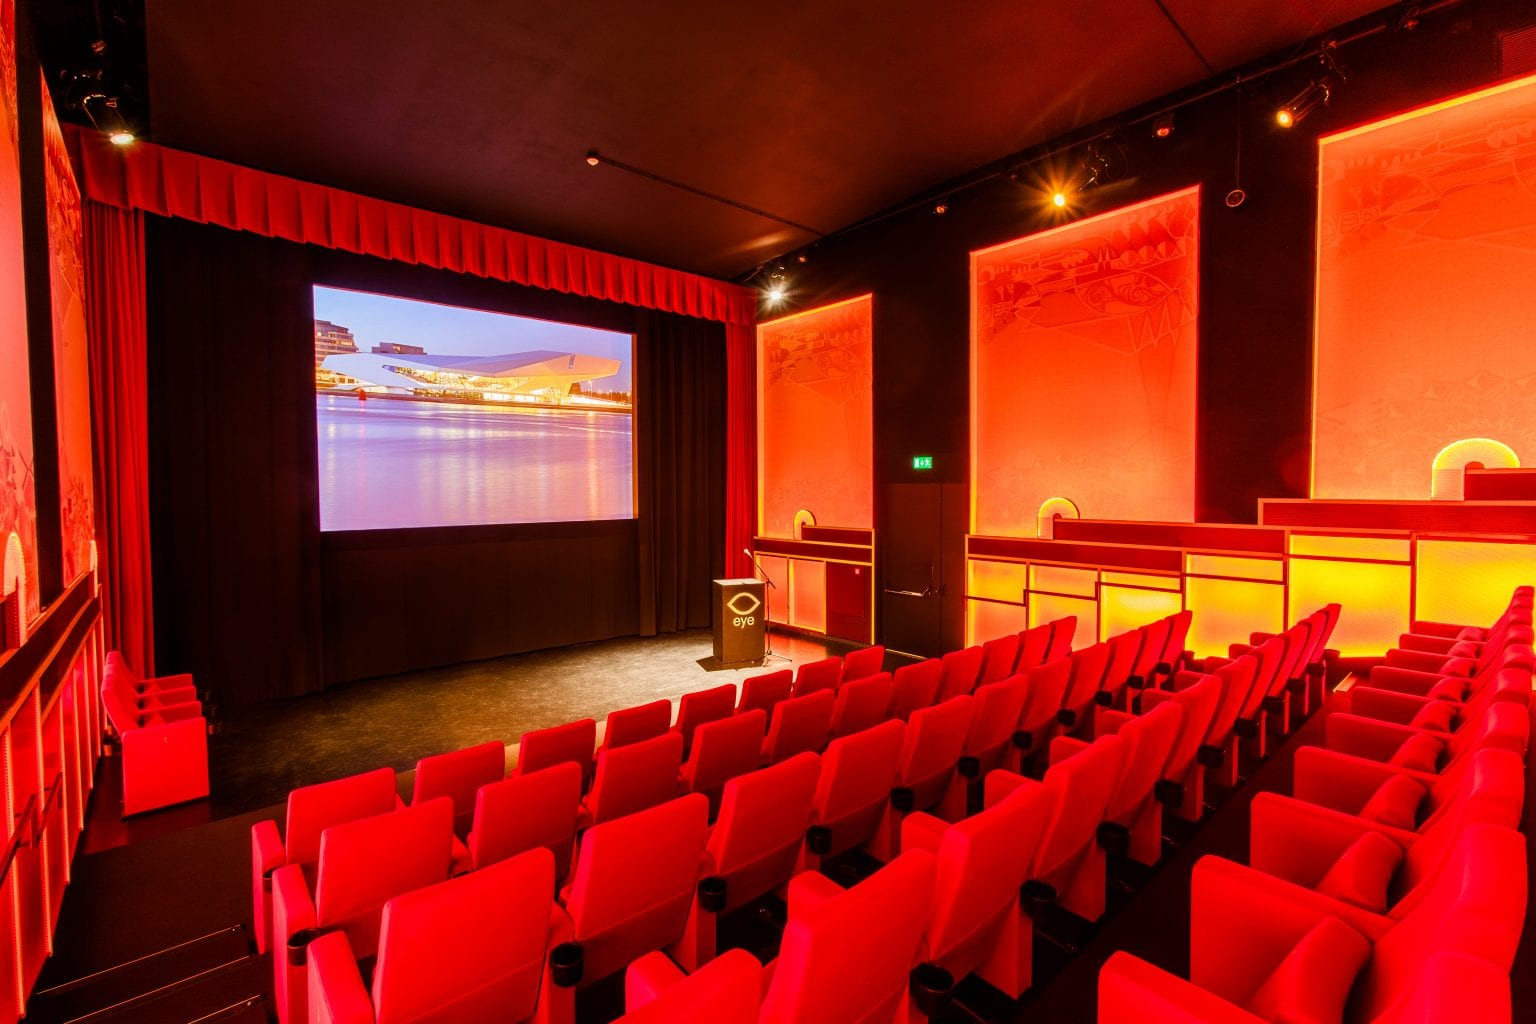 Cinema 4 - 67 seats